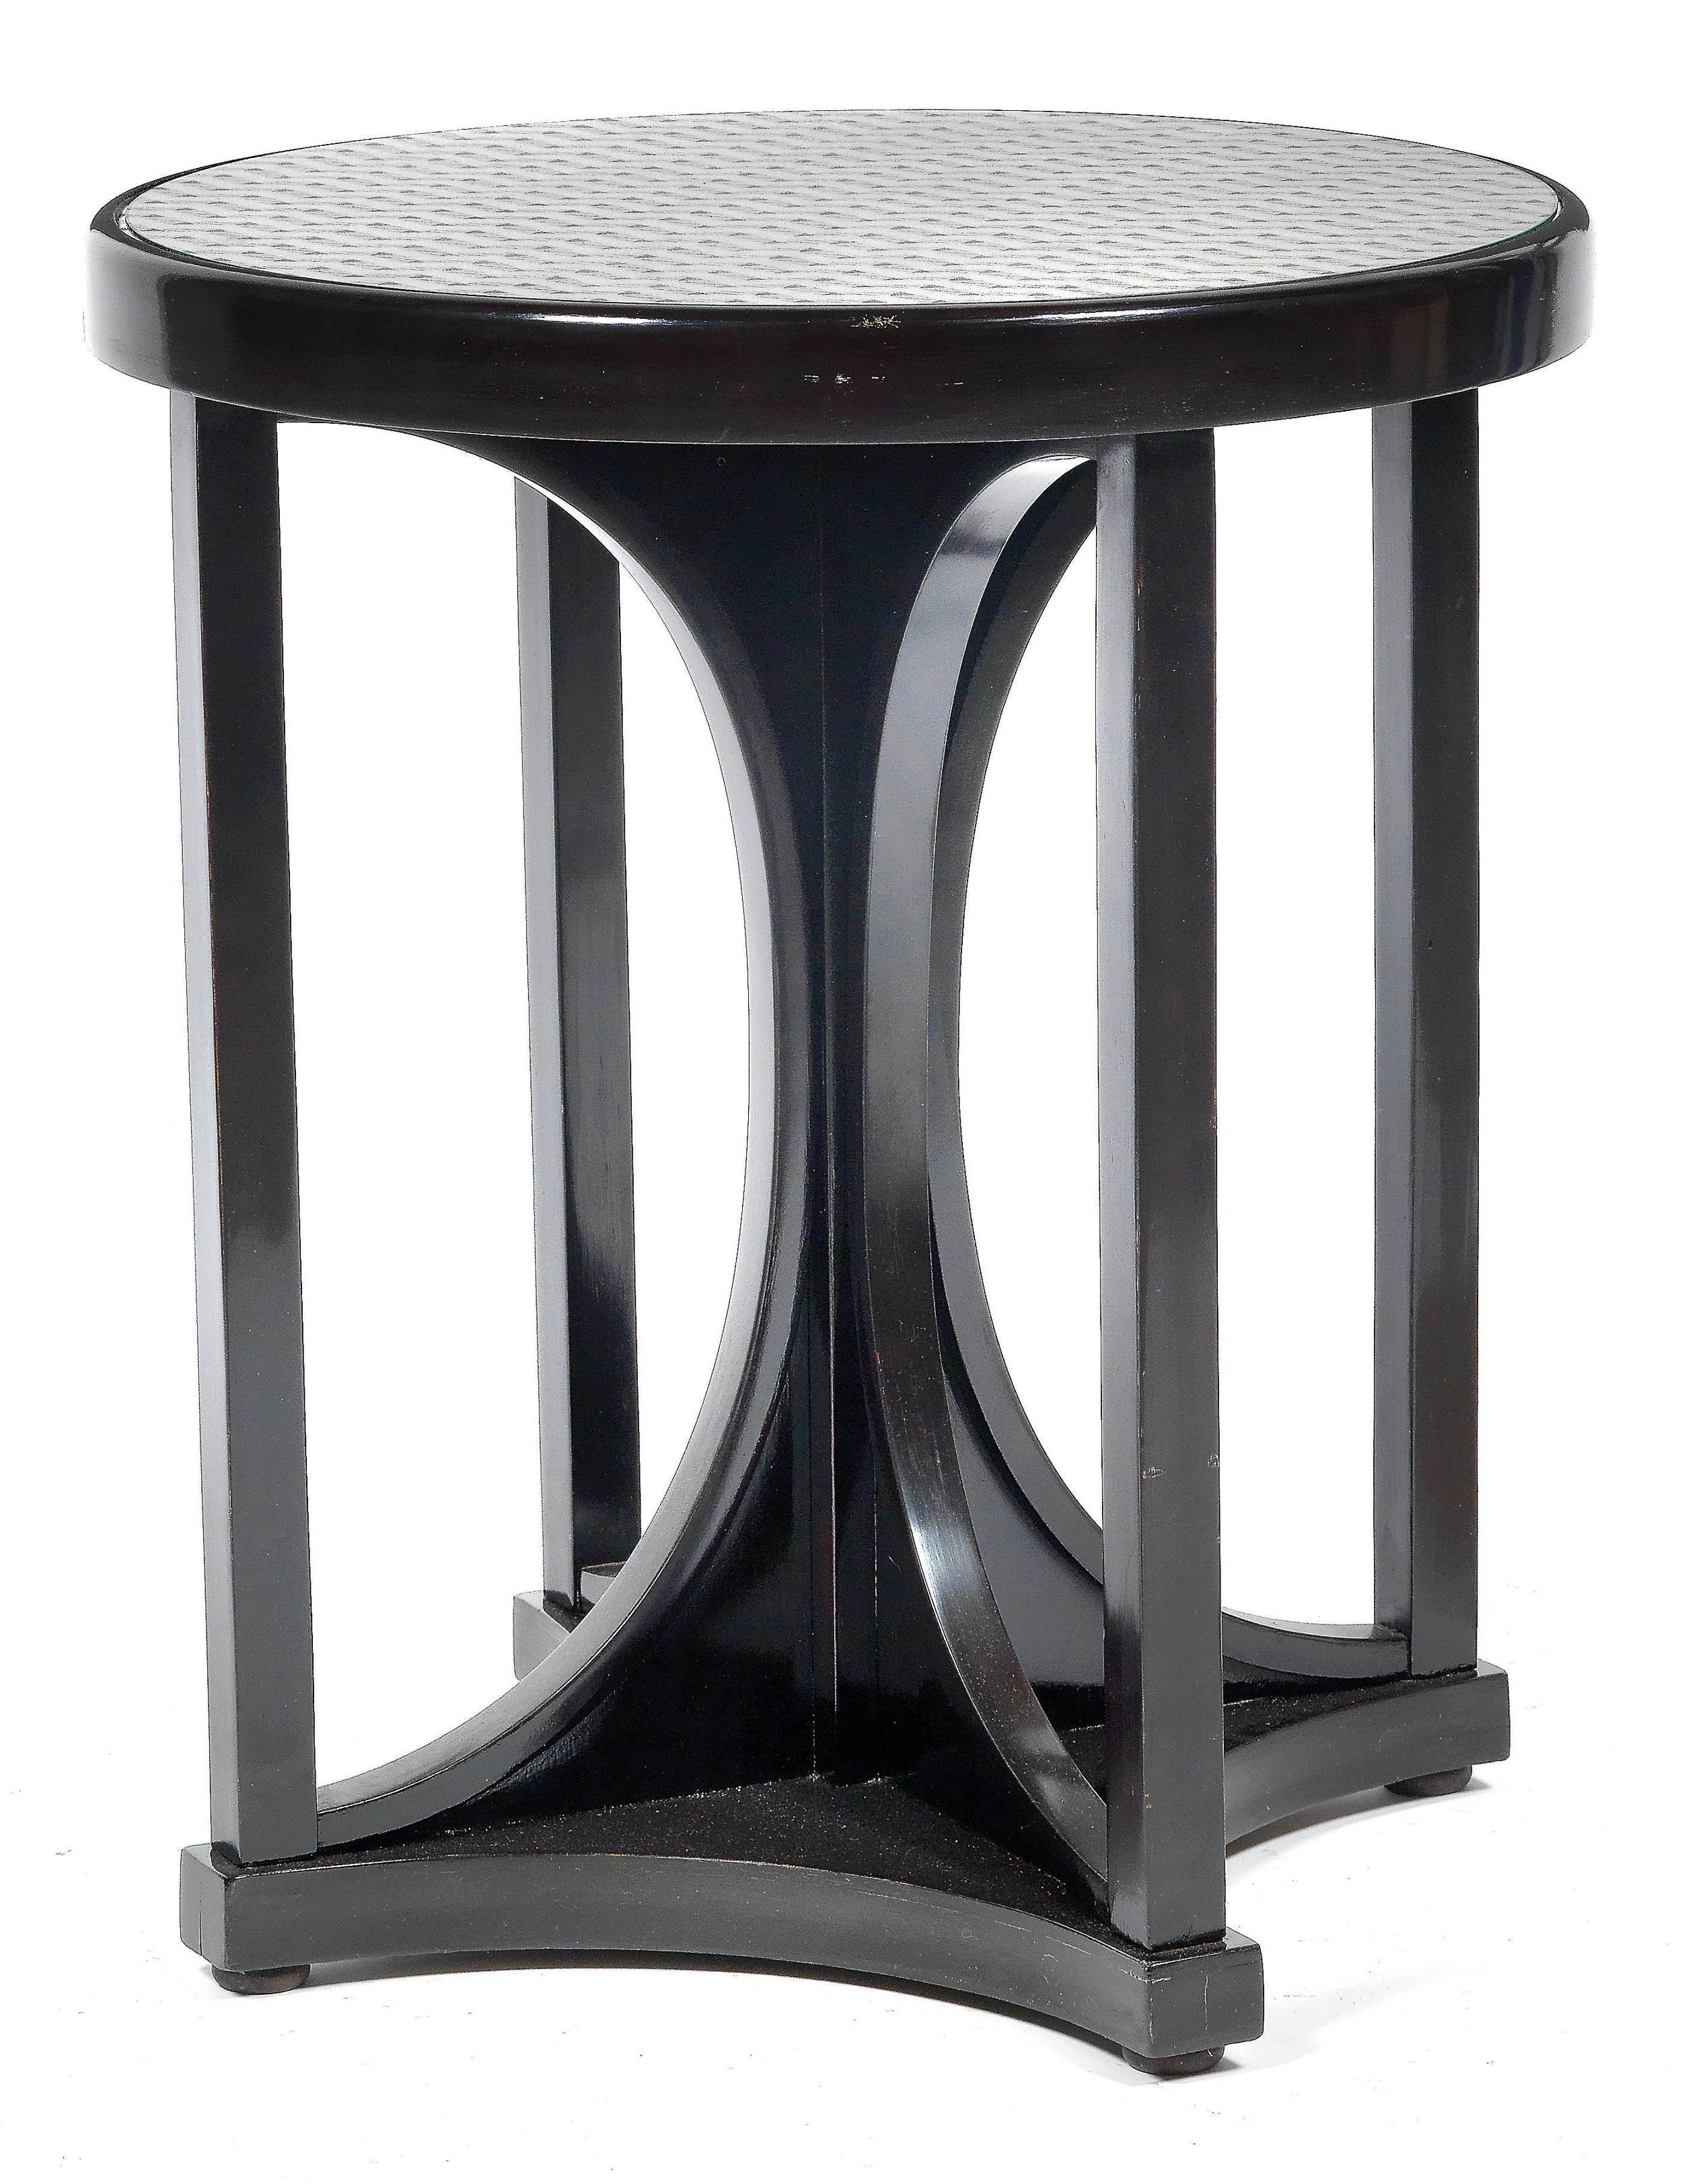 Josef Hoffmann (1870-1956) An Ebonised Occasional Table, designed, c.1910, Dorotheum Vienna